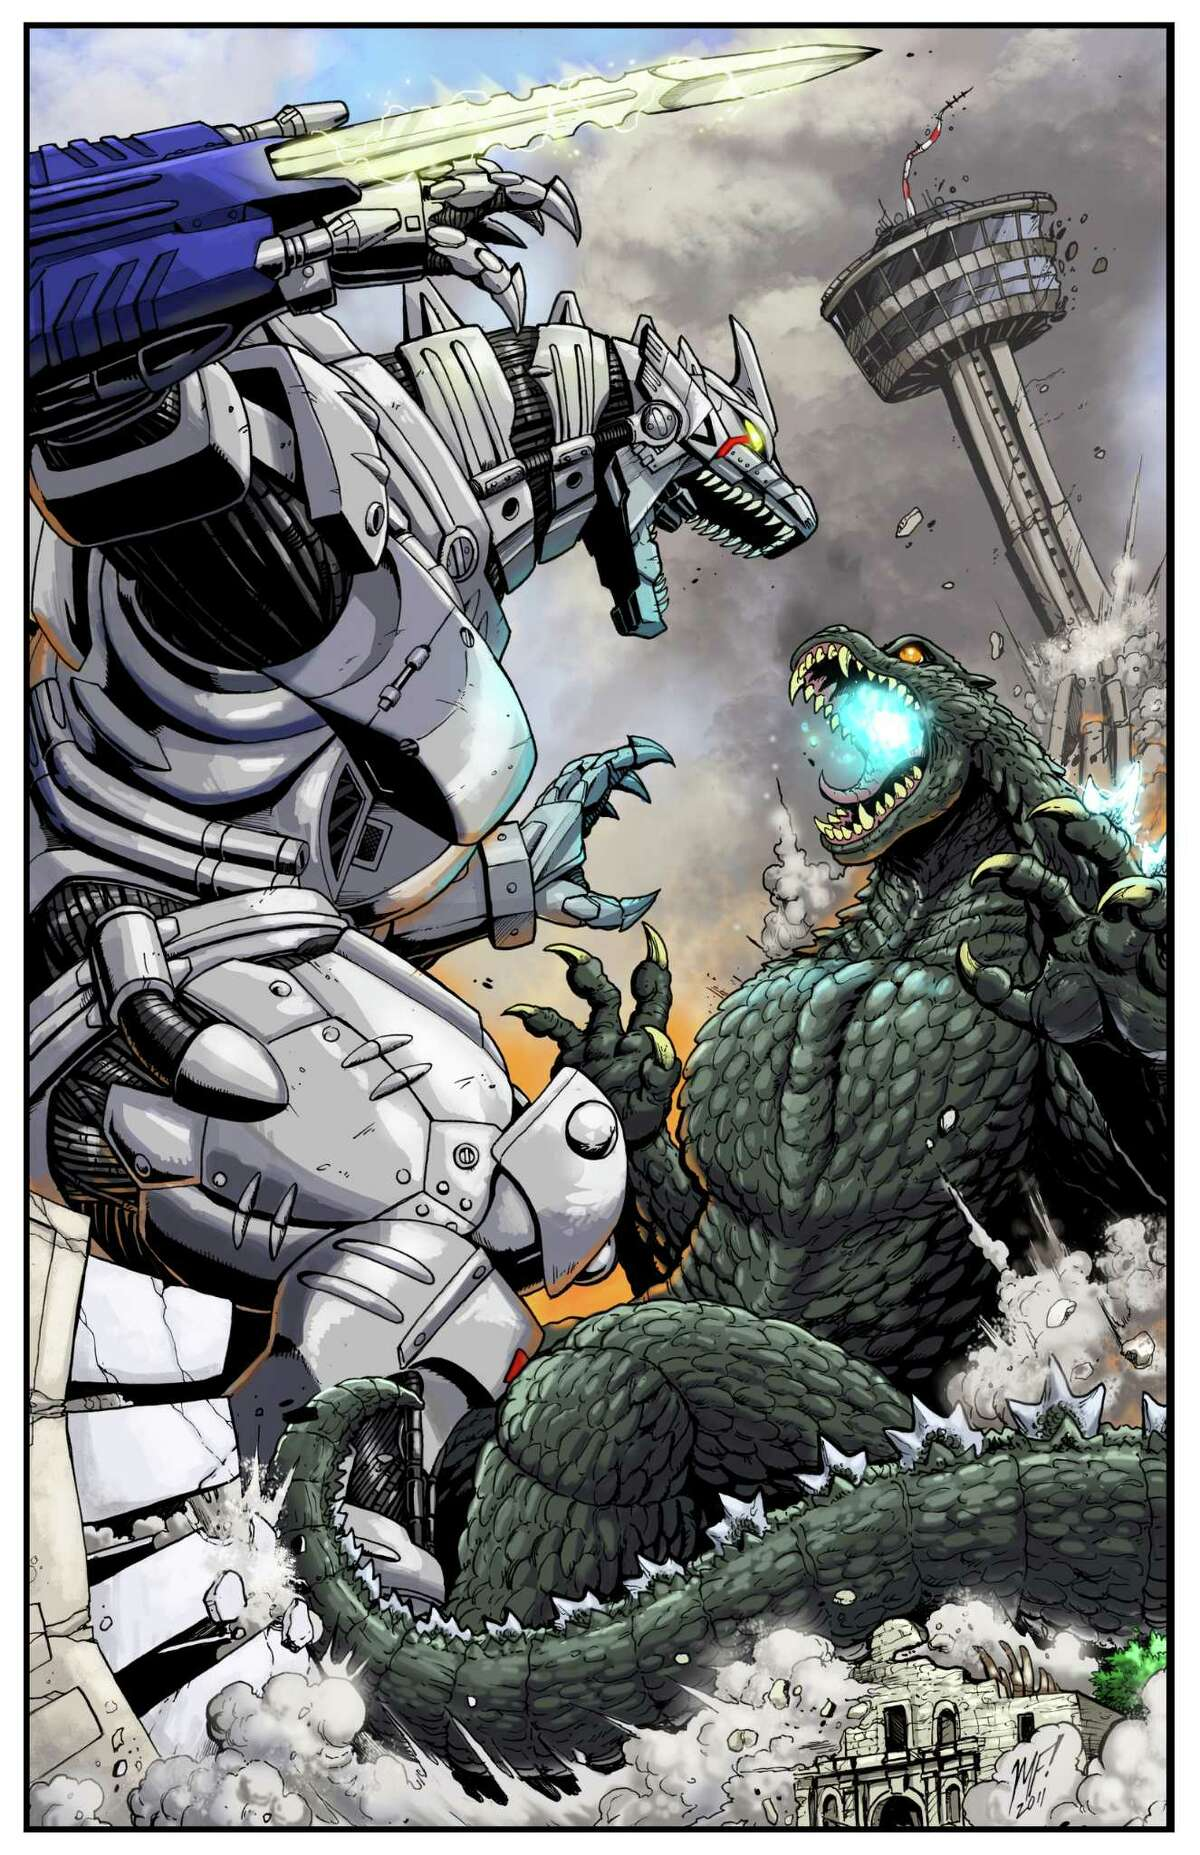 Godzilla vs. Mechagodzilla, art by San Antonio, Texas, native Matt Frank.